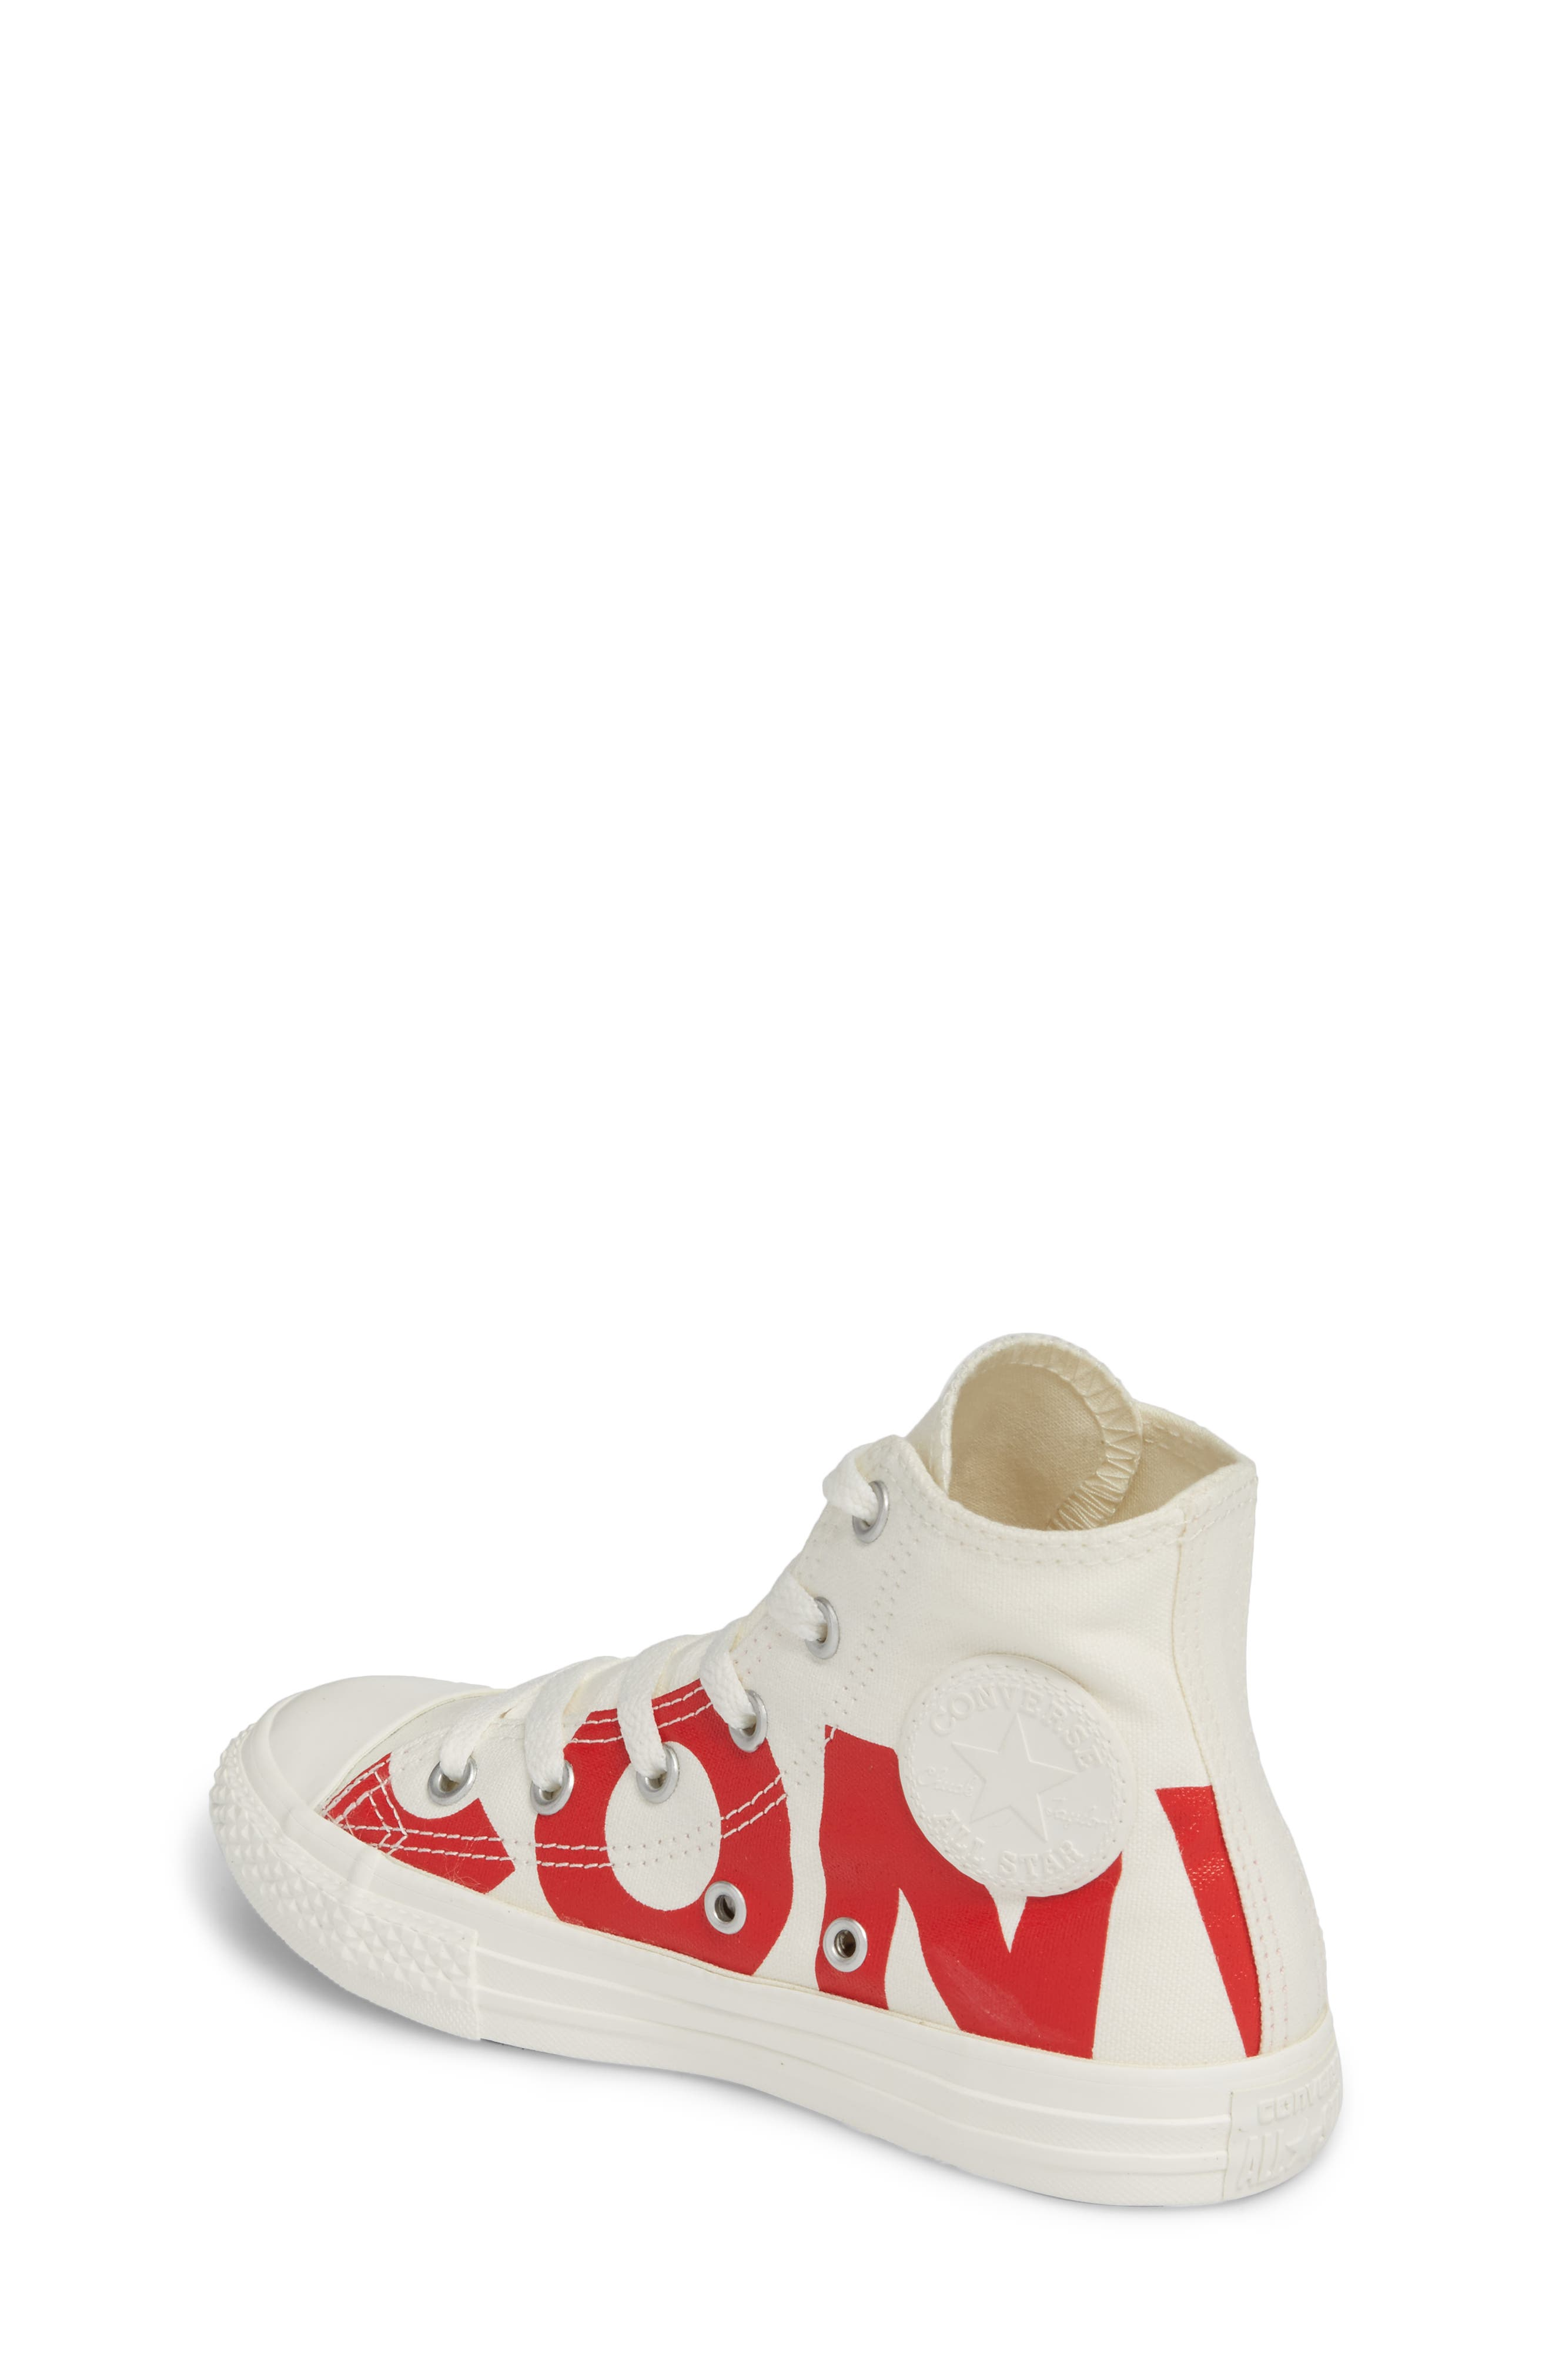 Chuck Taylor<sup>®</sup> All Star<sup>®</sup> Wordmark Hi Sneaker,                             Alternate thumbnail 2, color,                             600